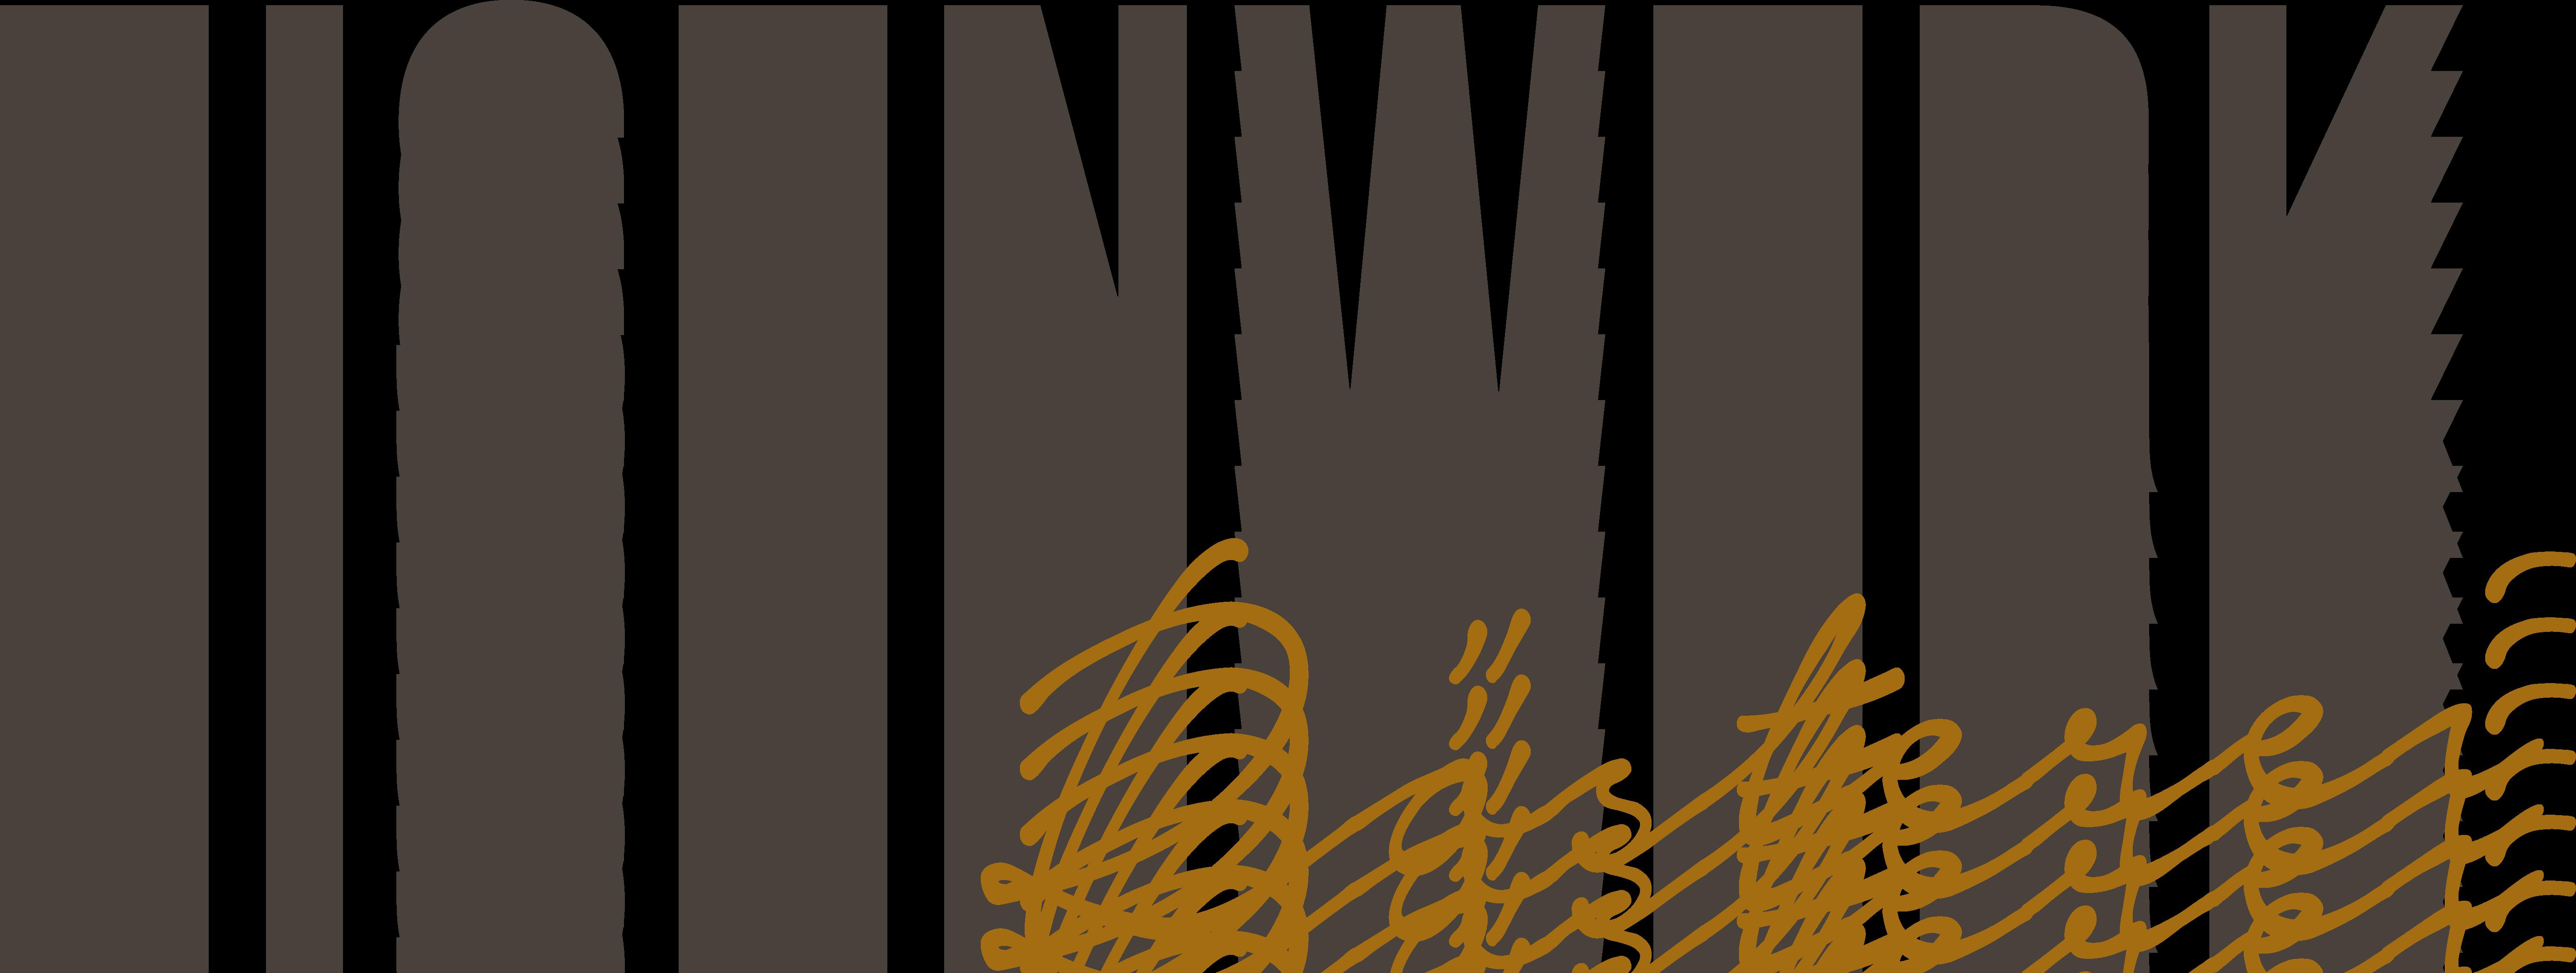 Rösterei Eisenwerk